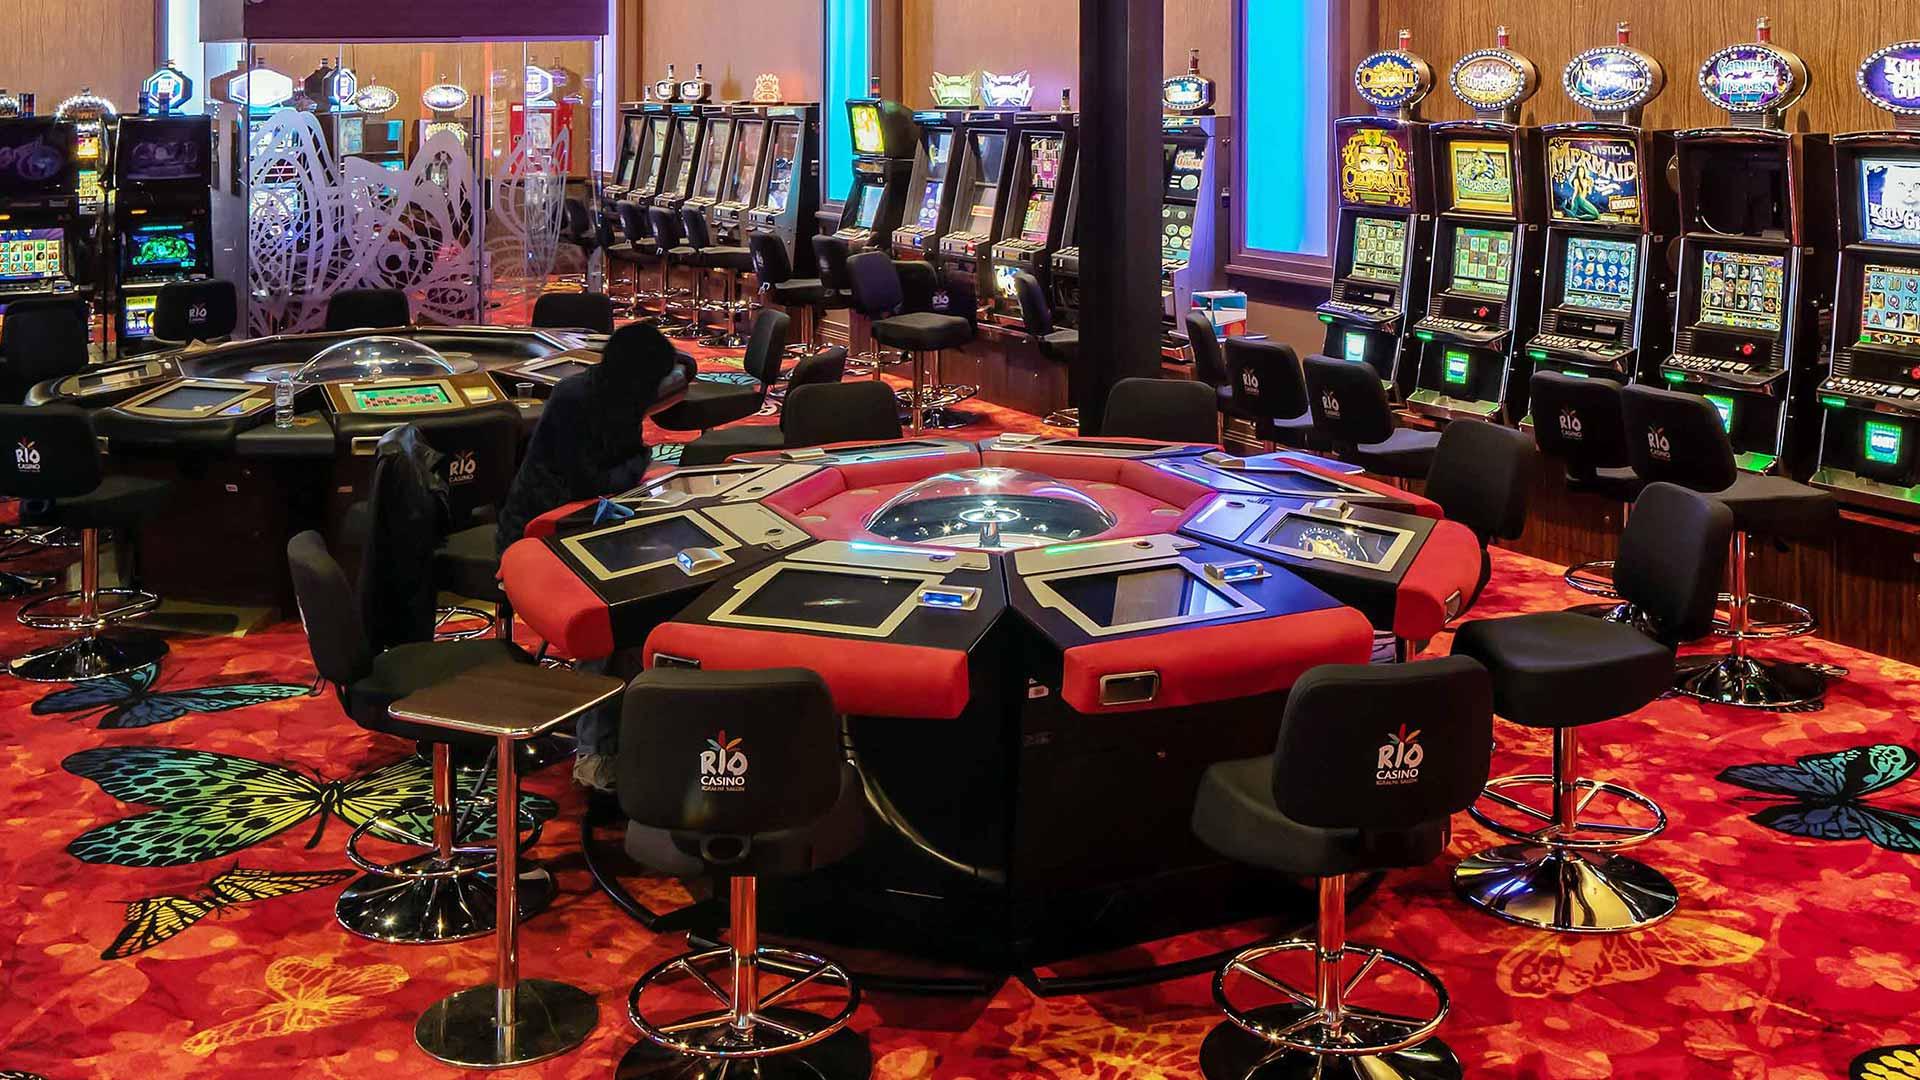 Casino Rio - igralni salon